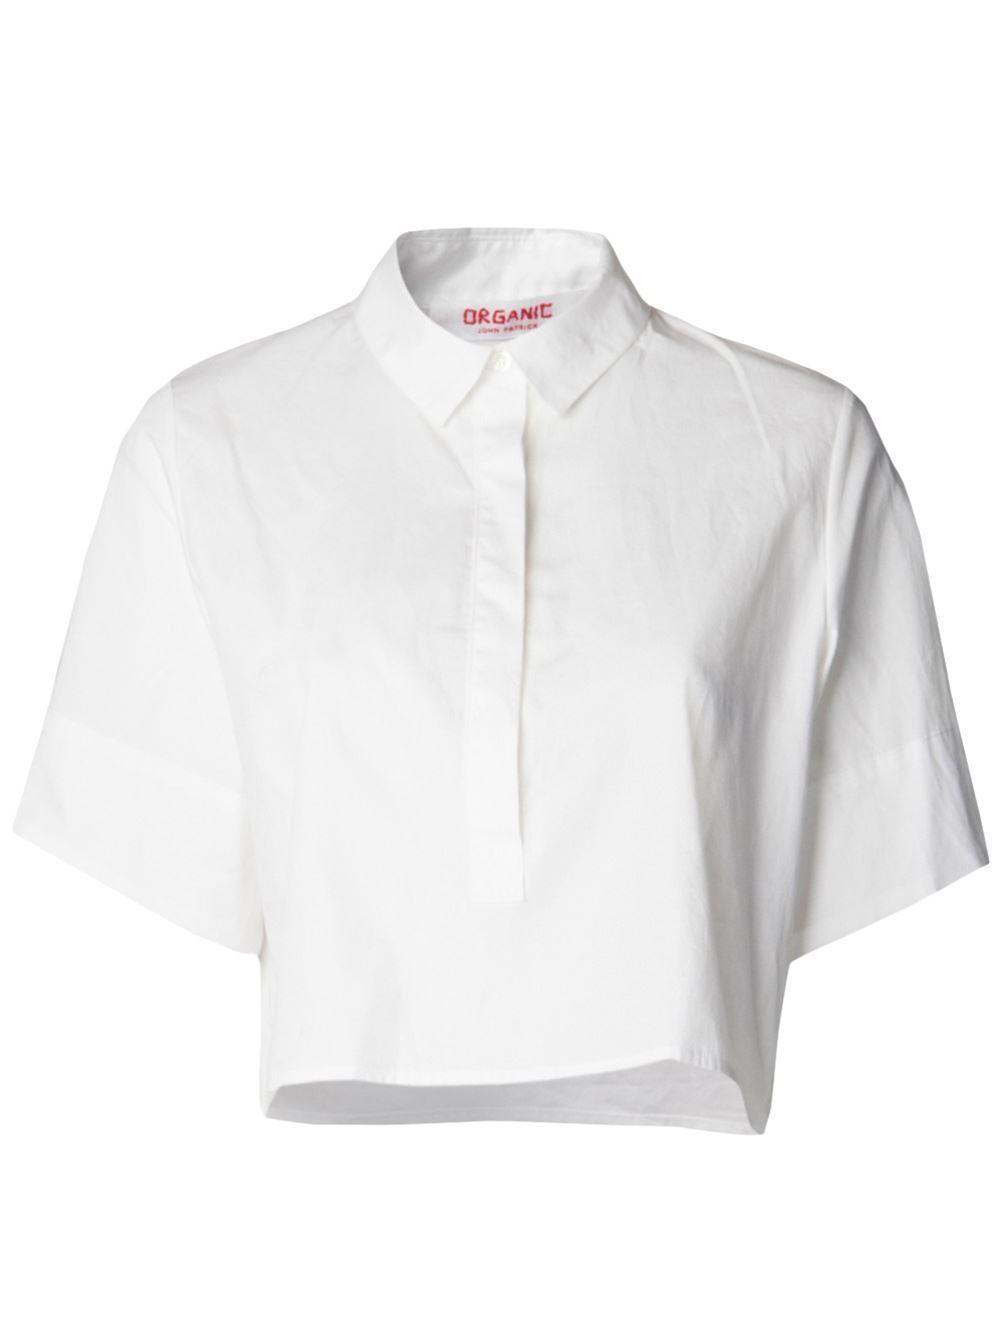 Organic By John Patrick Cropped Button Down Shirt - Mario's - Farfetch.com